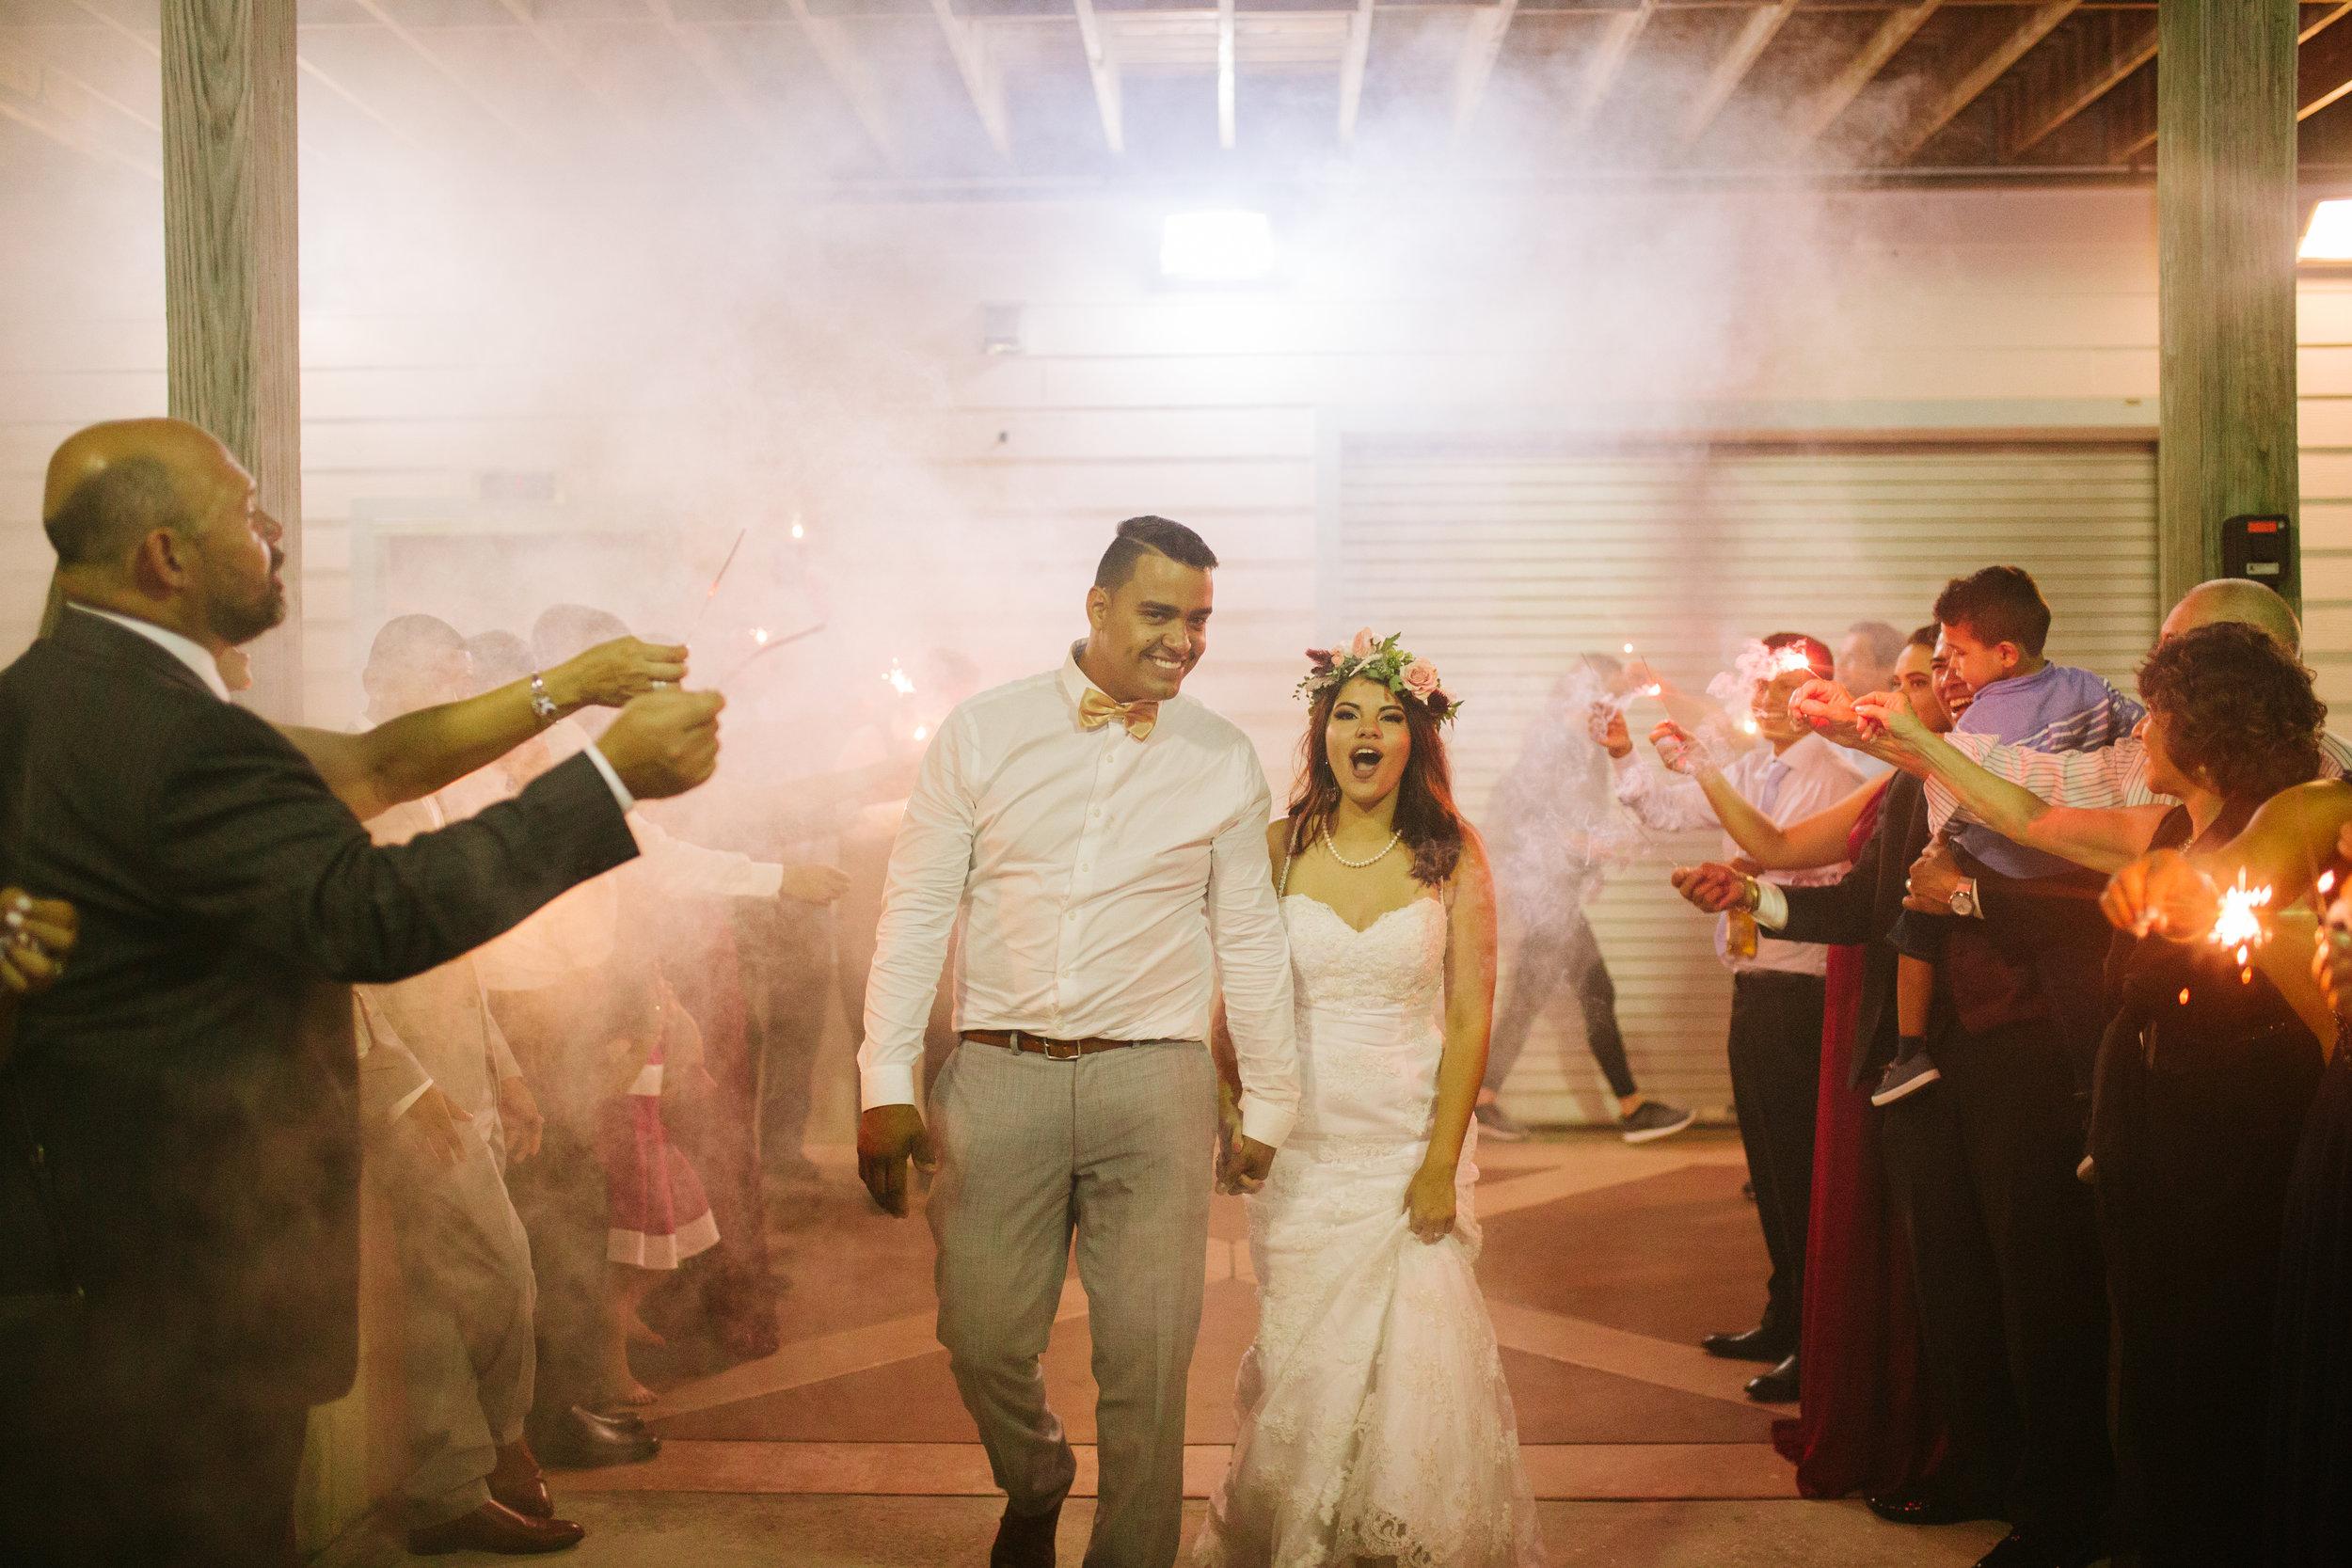 2017.05.23 Barbara and Mauricio Sales Port St Lucie Wedding (763 of 772).jpg